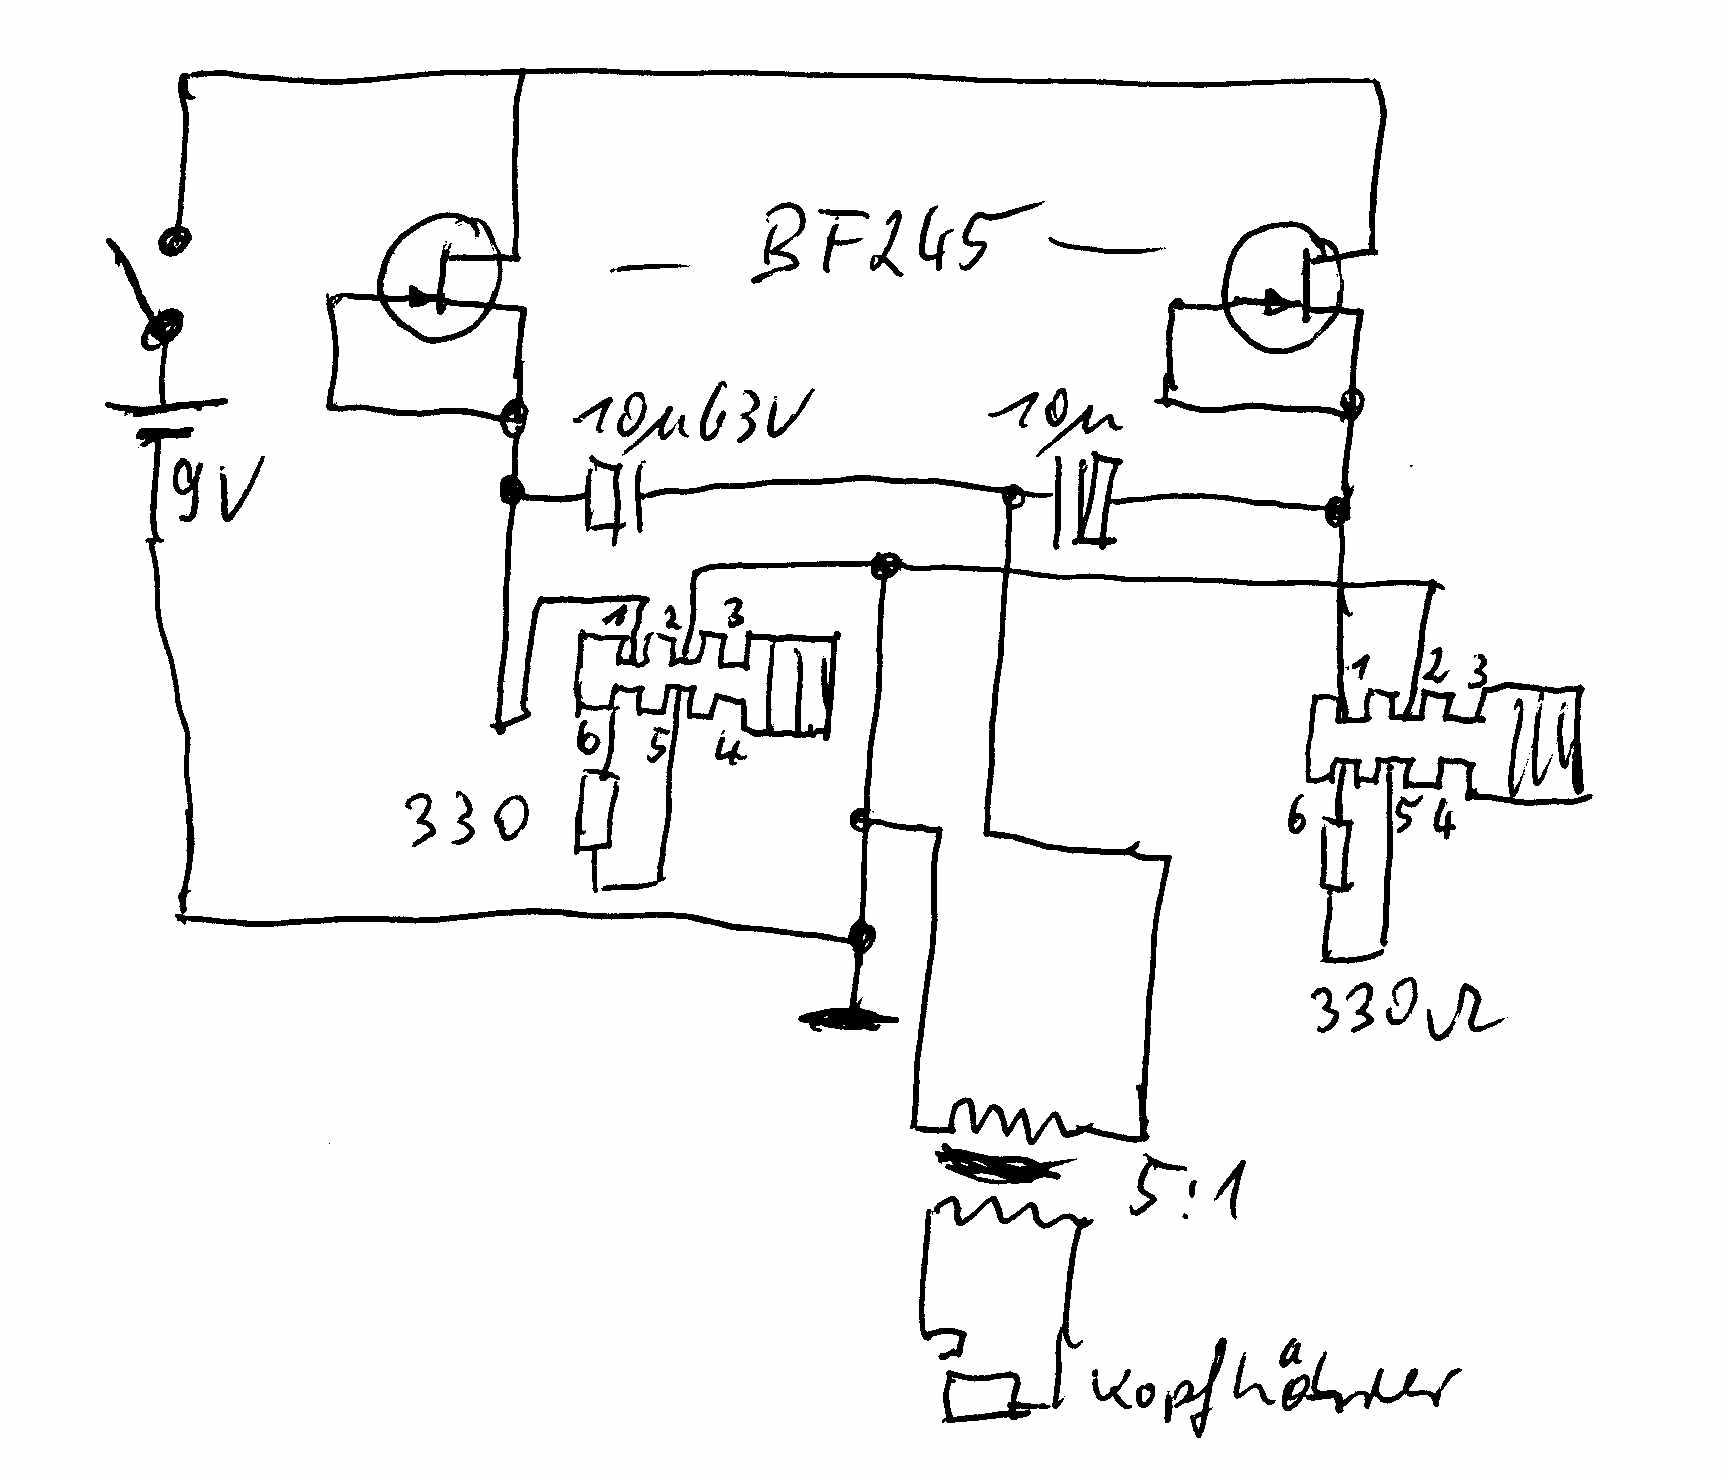 Zwei Telefone verbinden. - Mikrocontroller.net